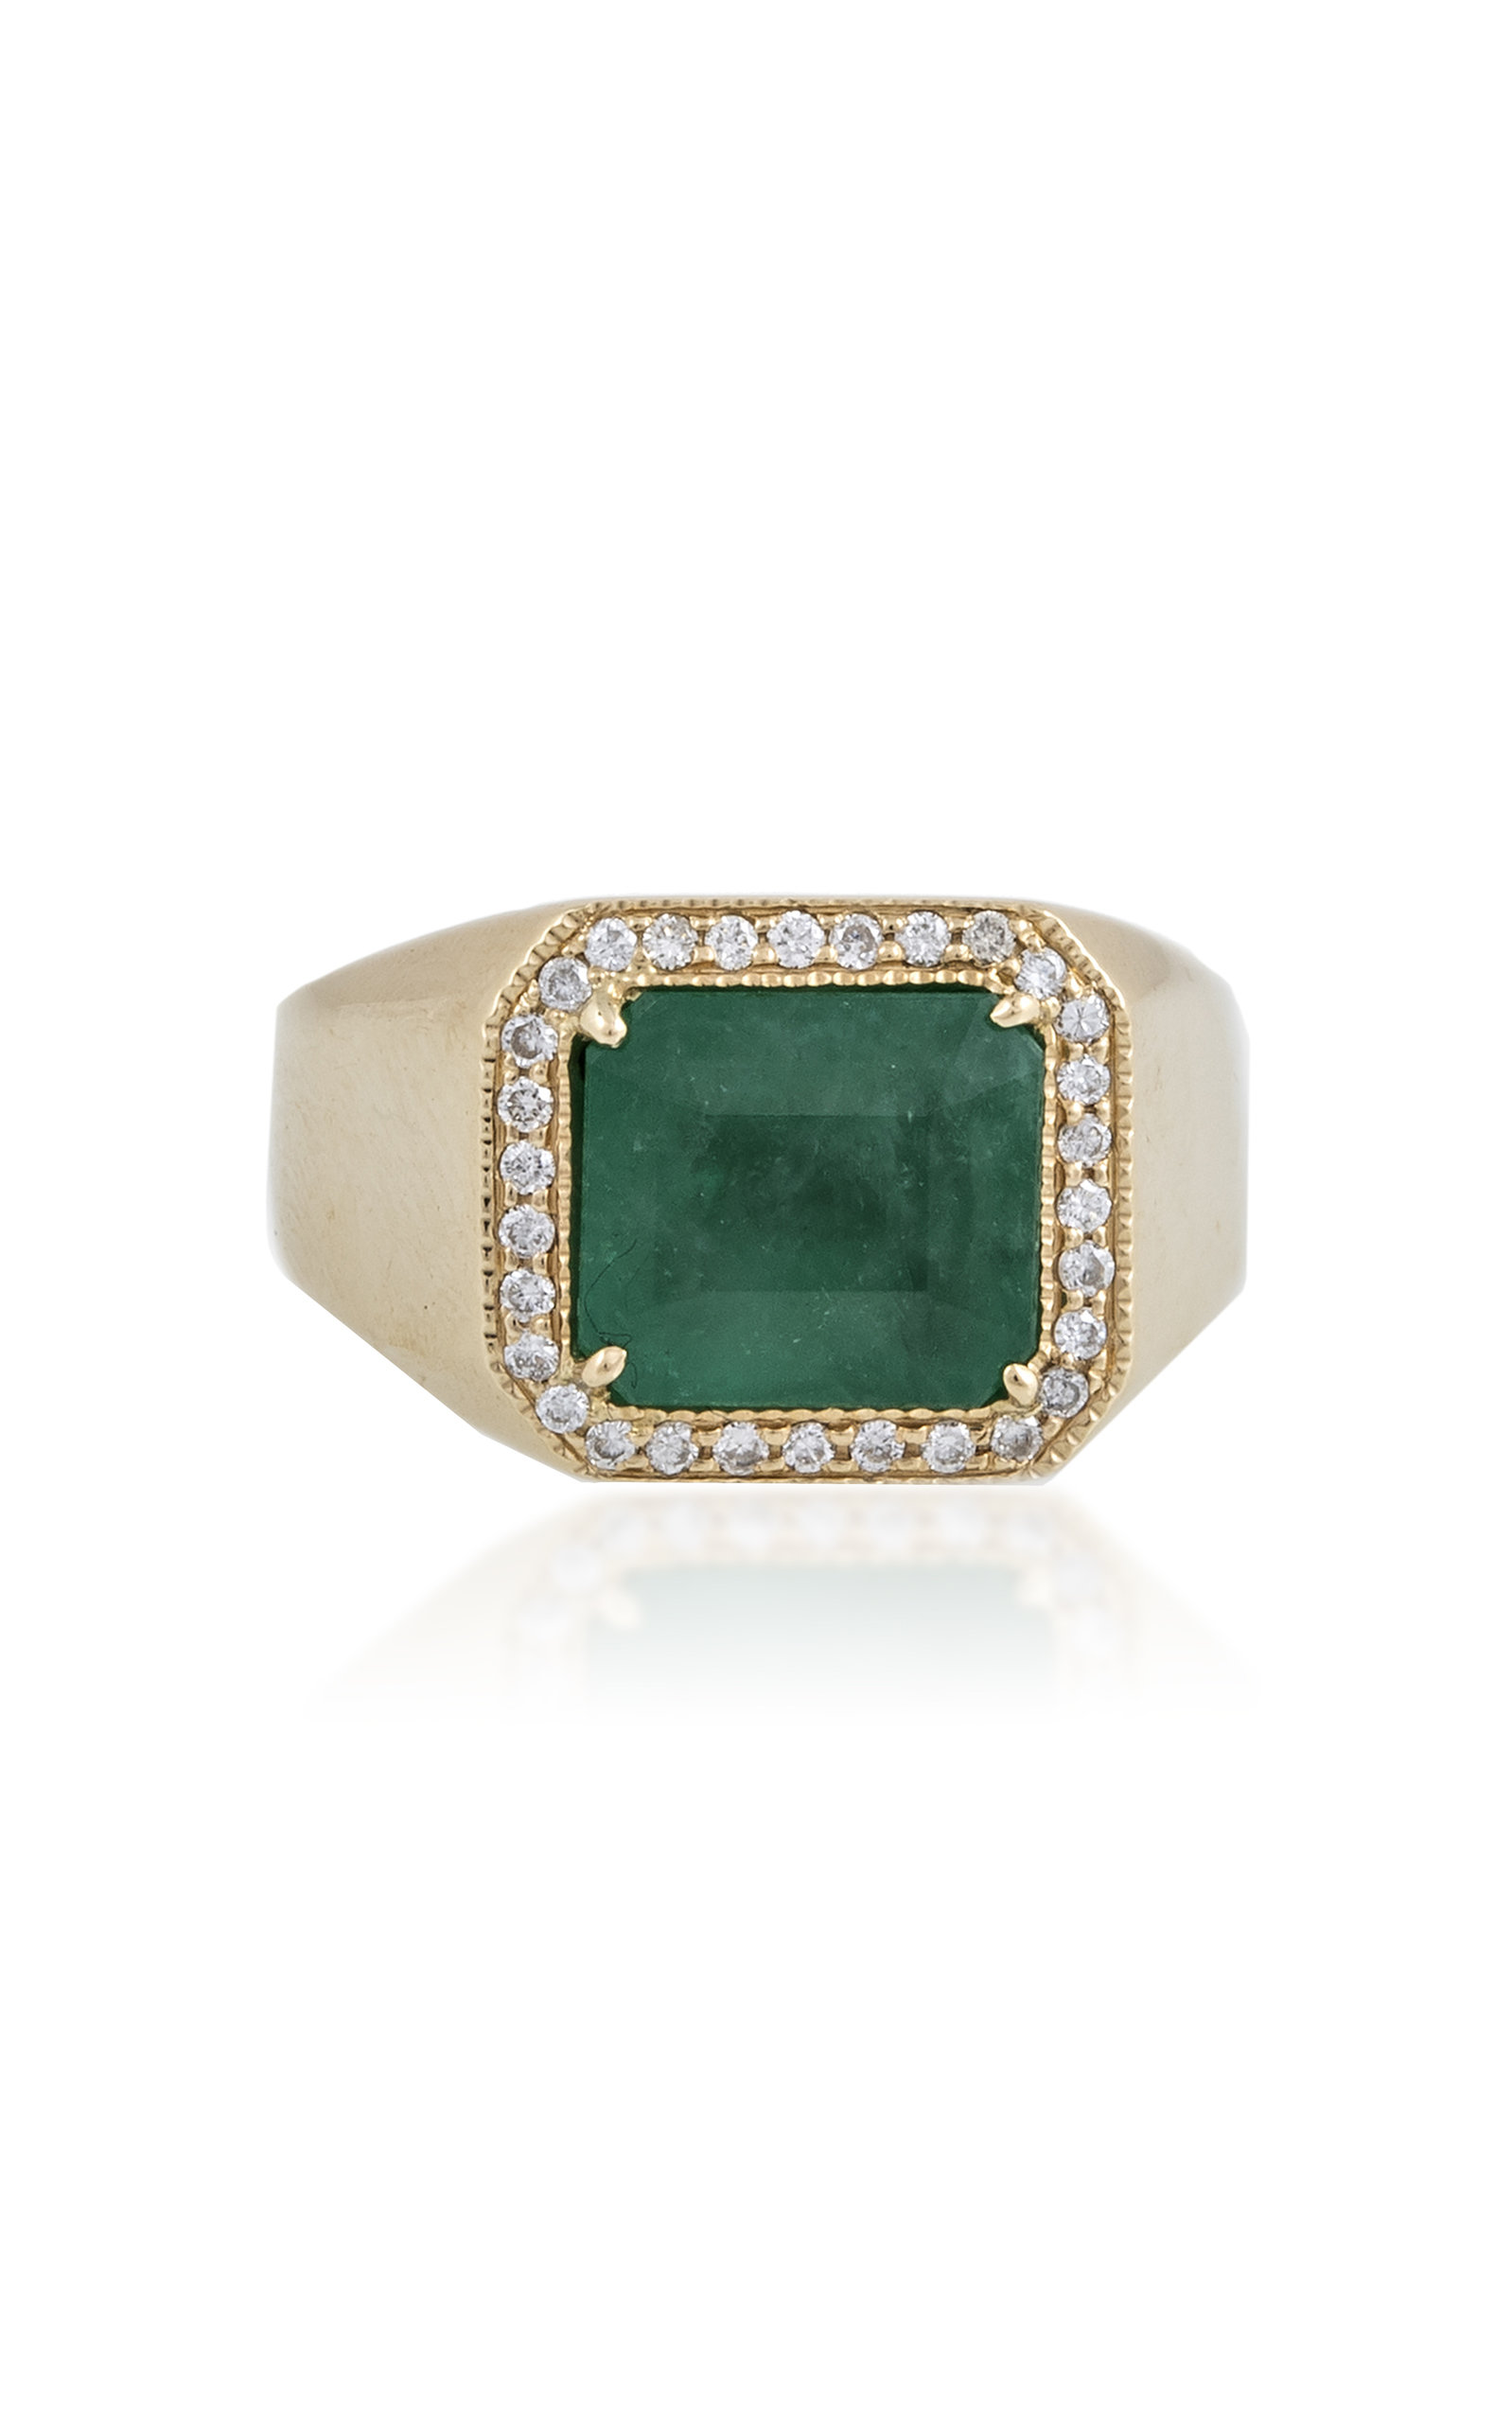 Jacquie Aiche 14K YELLOW GOLD EMERALD DIAMOND RING